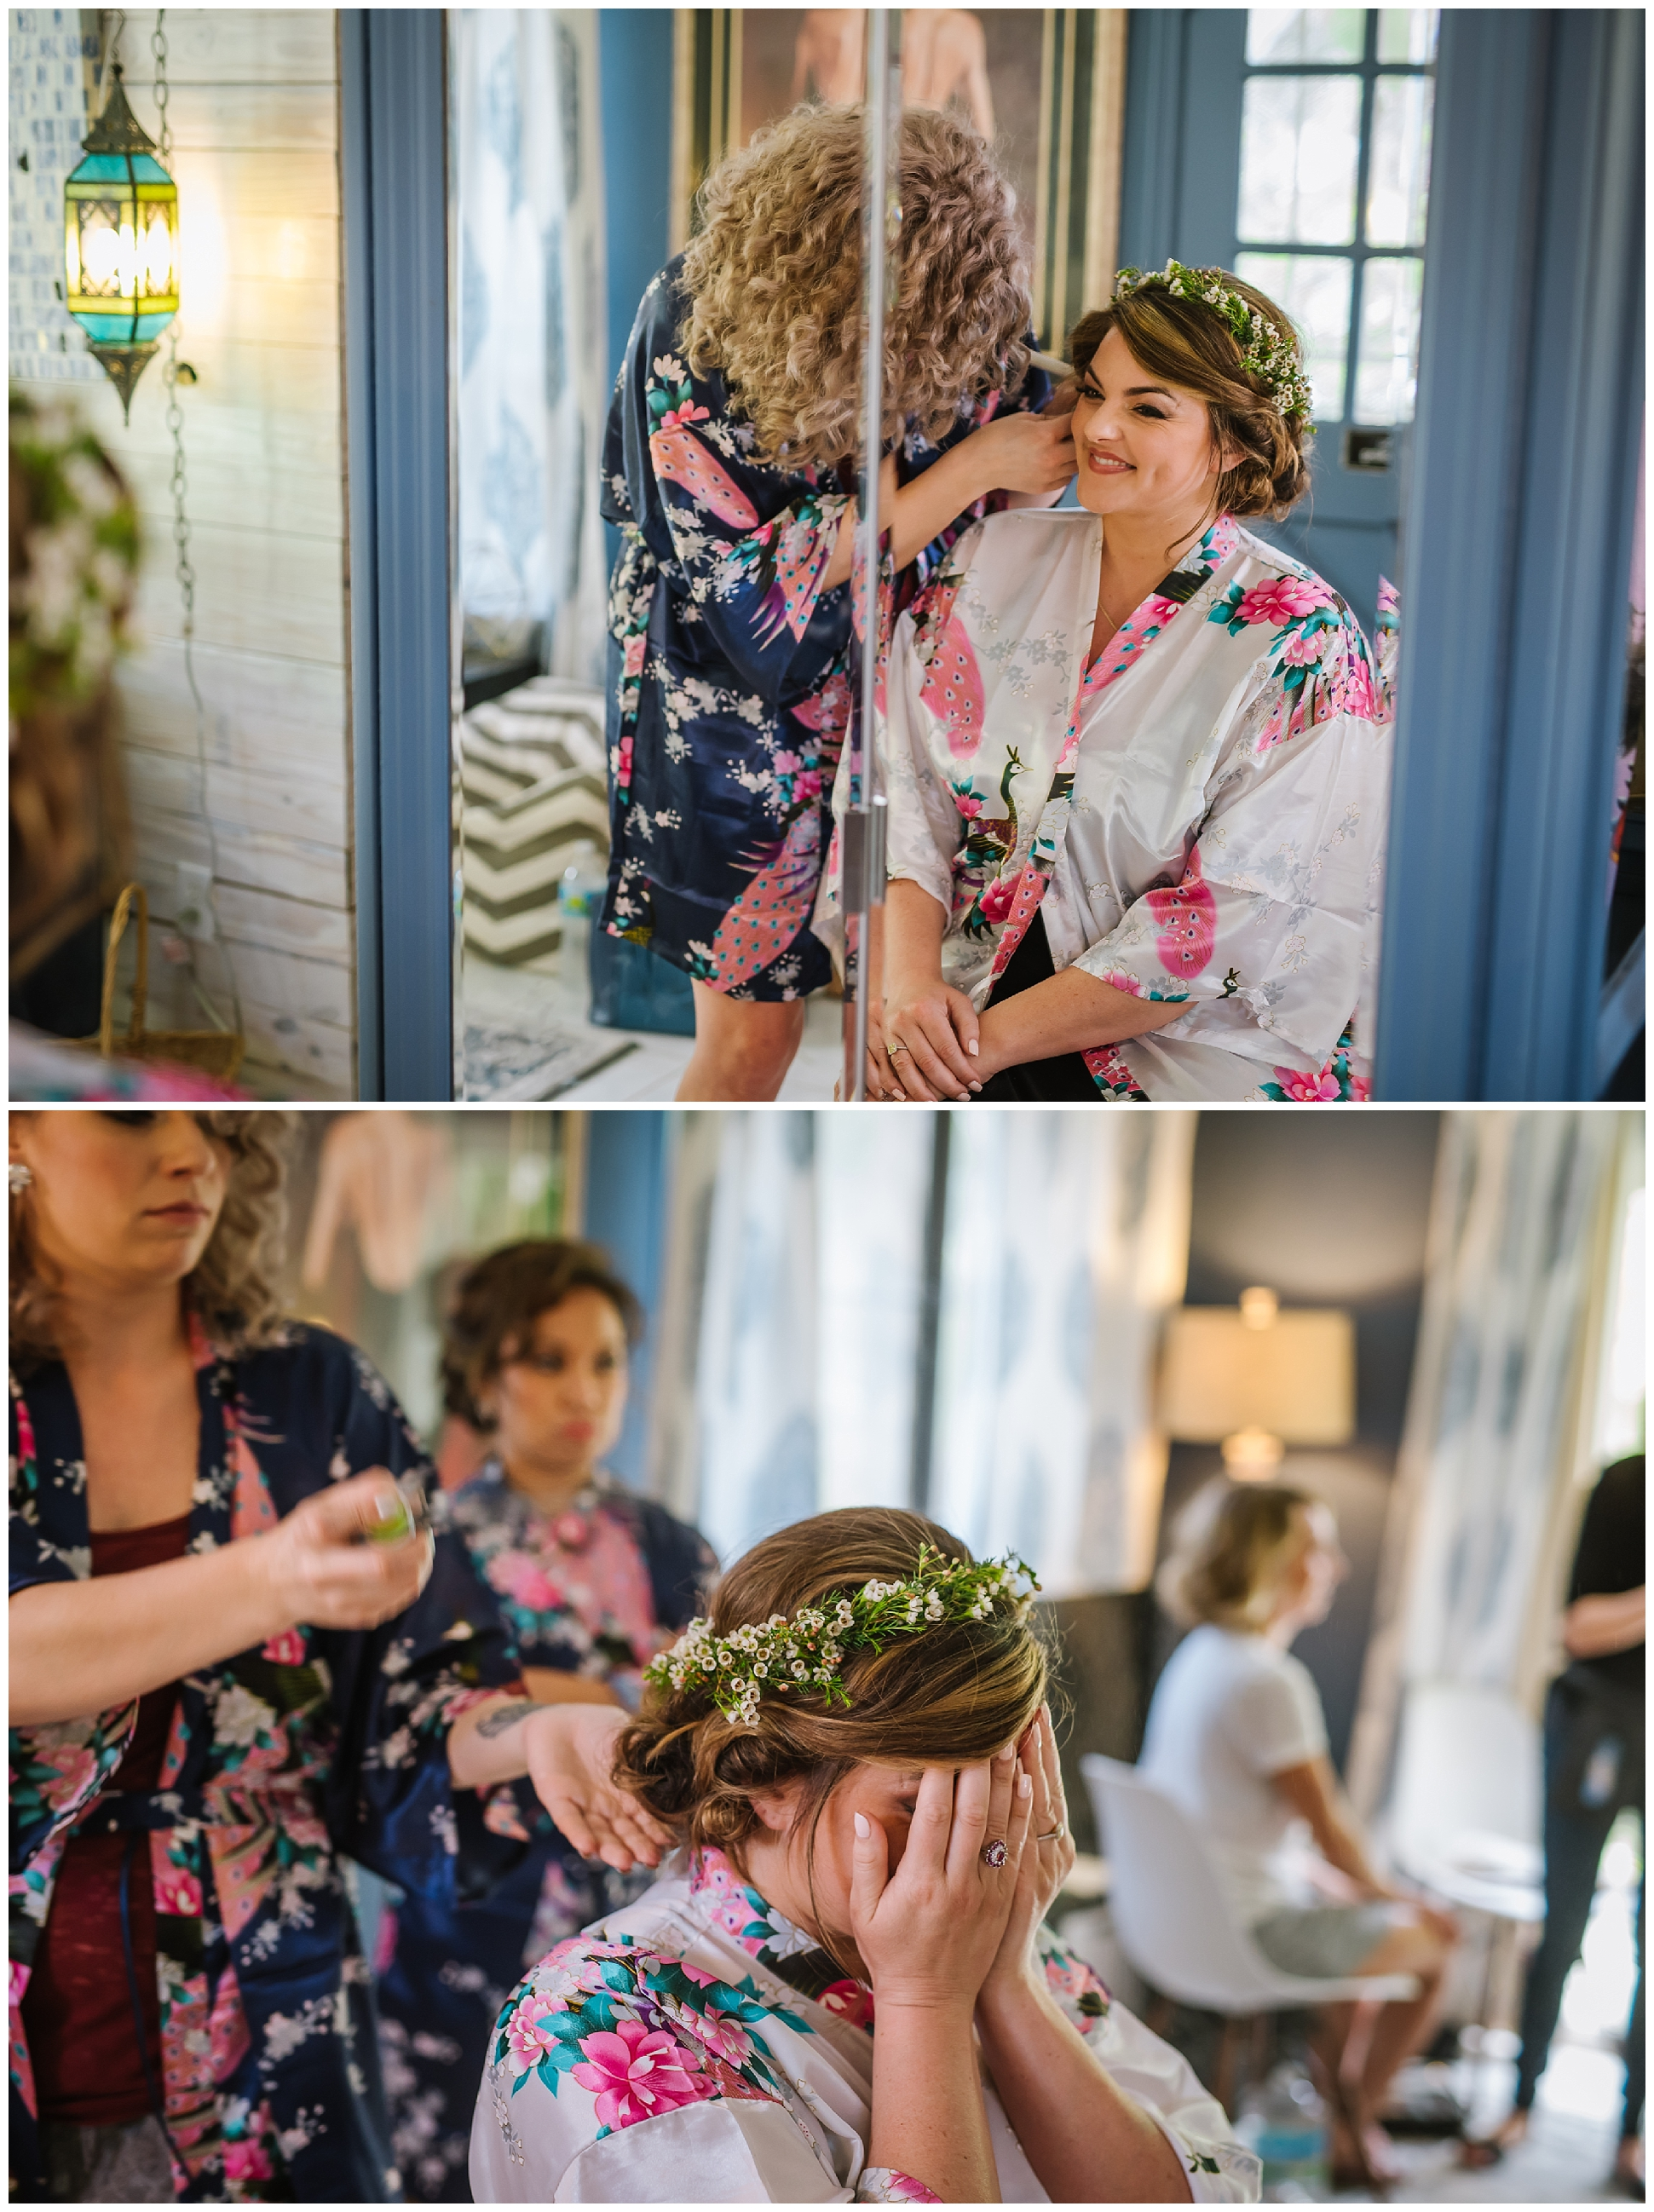 st-pete-wedding-photographer-italian-romance-theme-rustic-flower-crown_0378.jpg